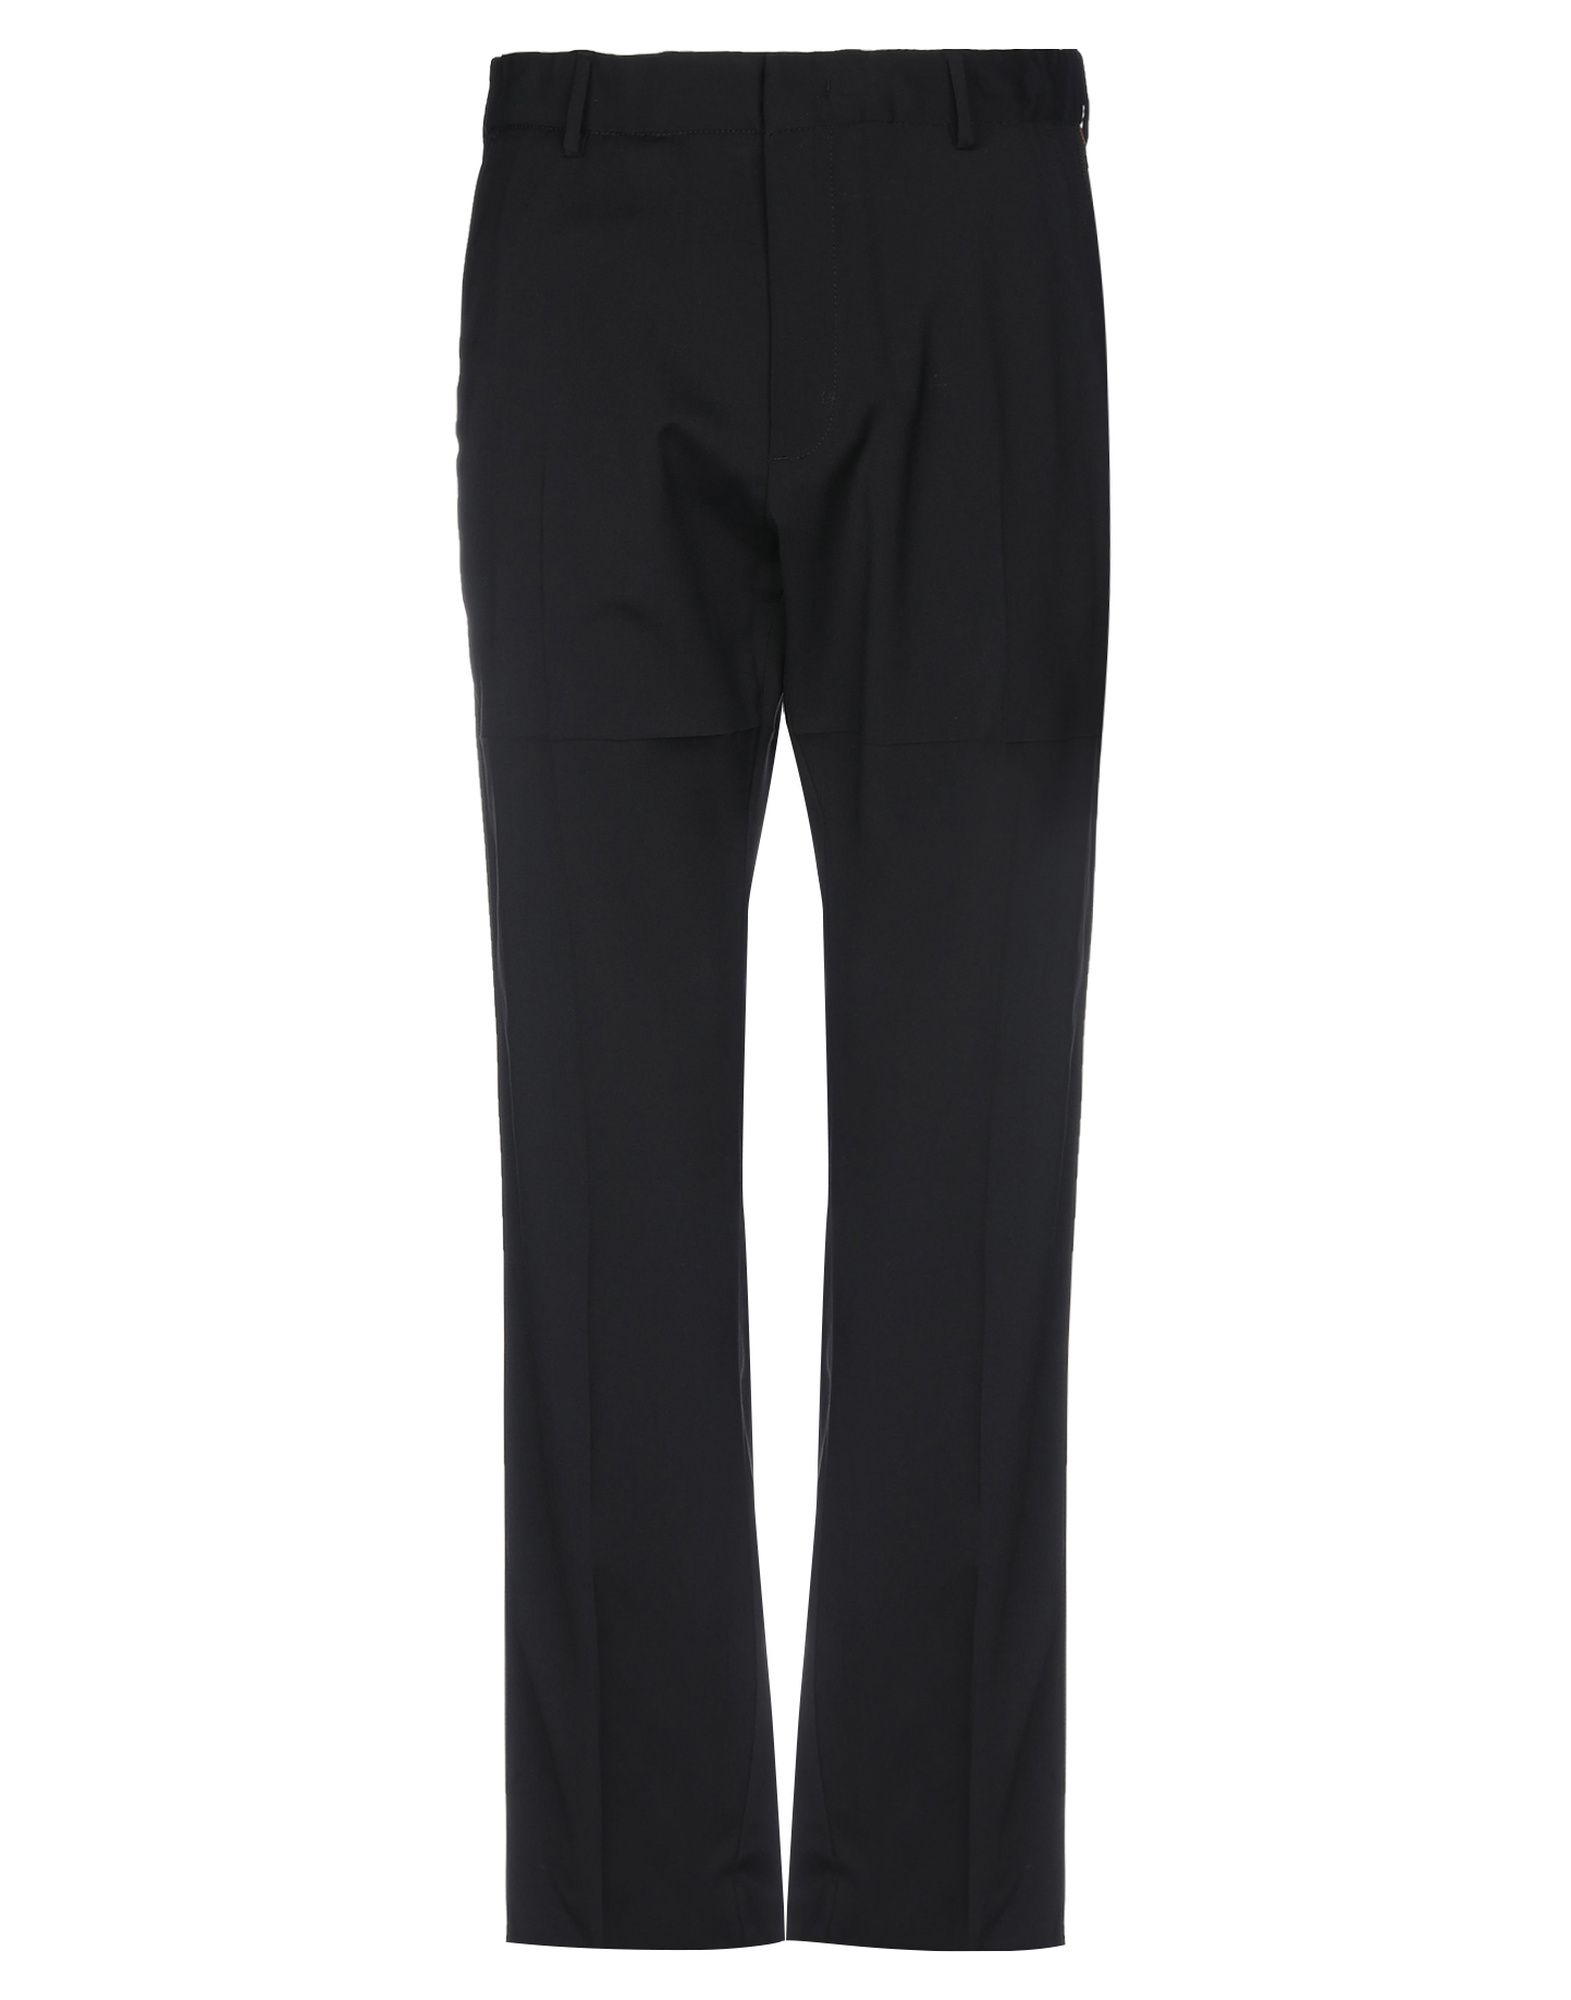 Pantalone N°21 uomo uomo - 13322483VG  Online bestellen